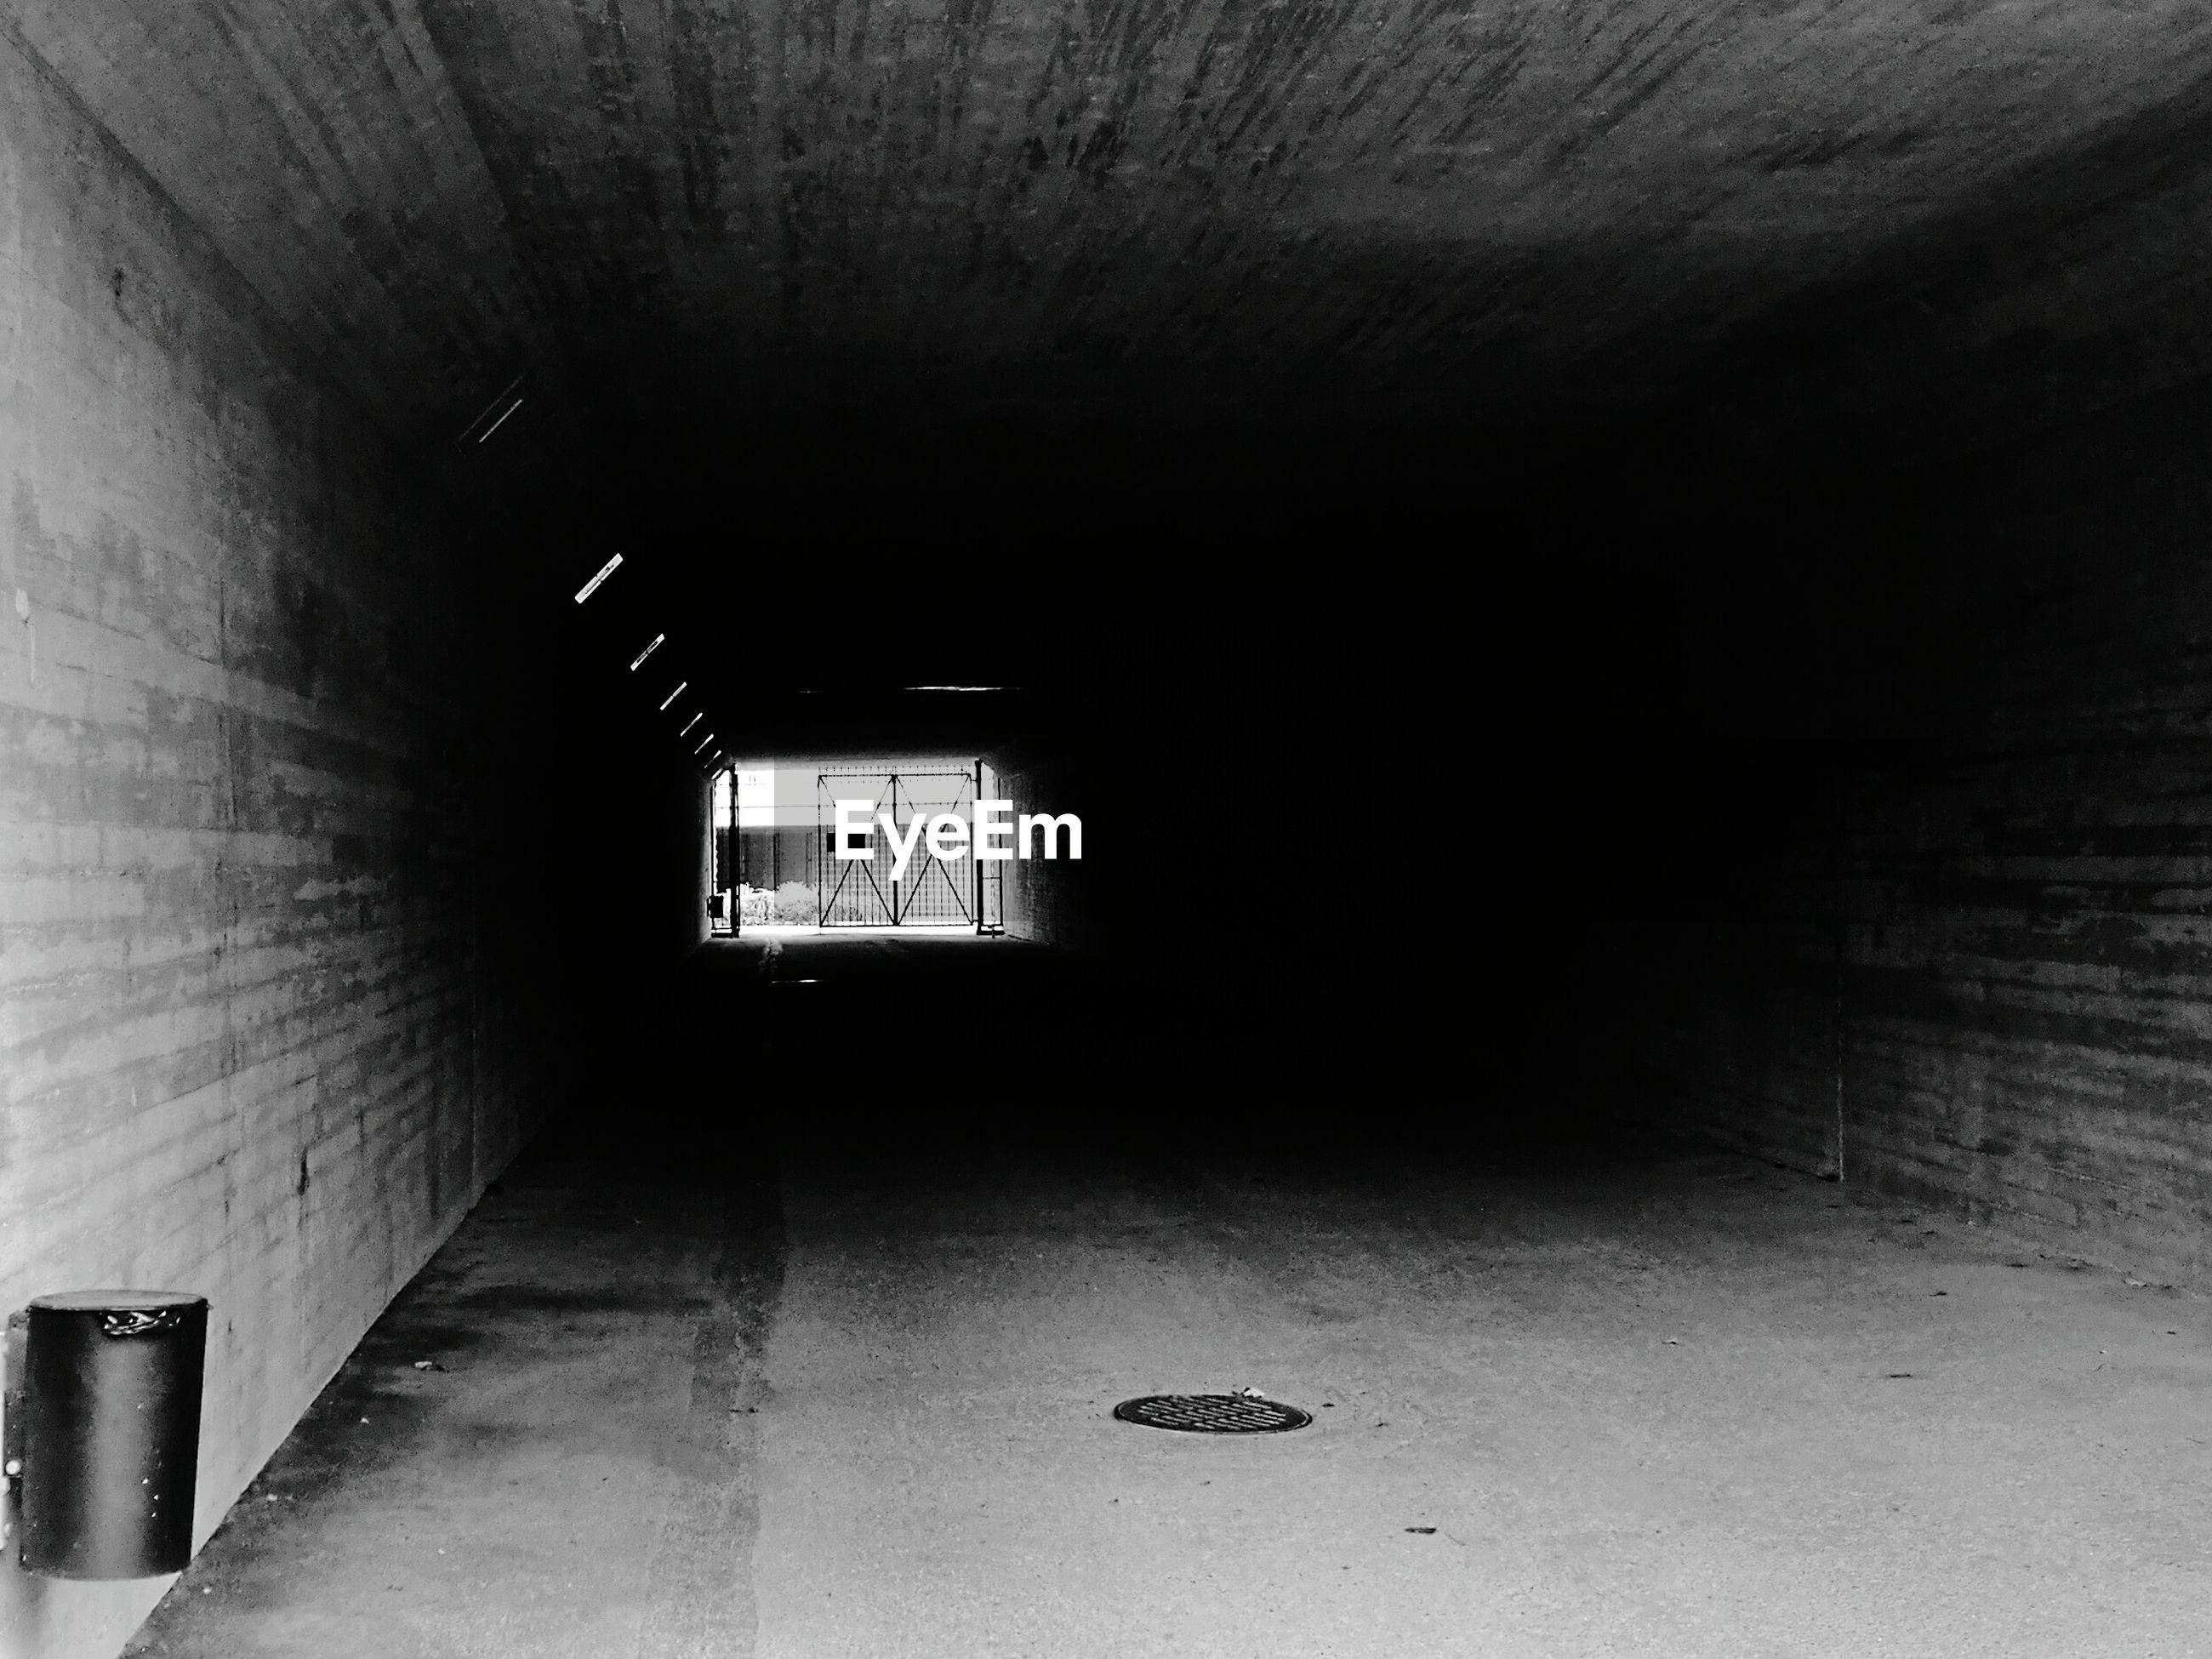 Interior of tunnel